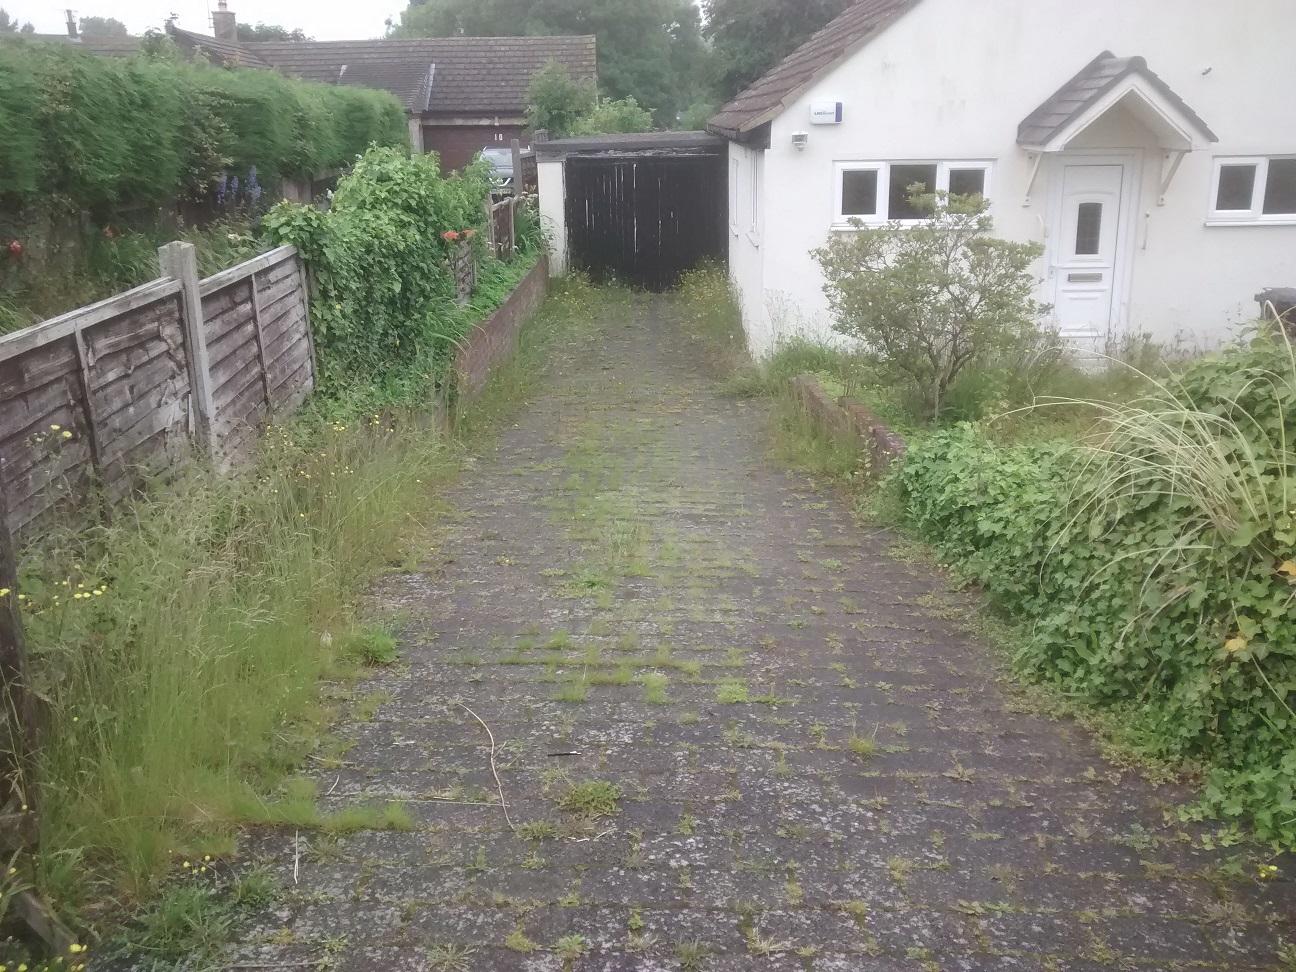 Weedy driveway